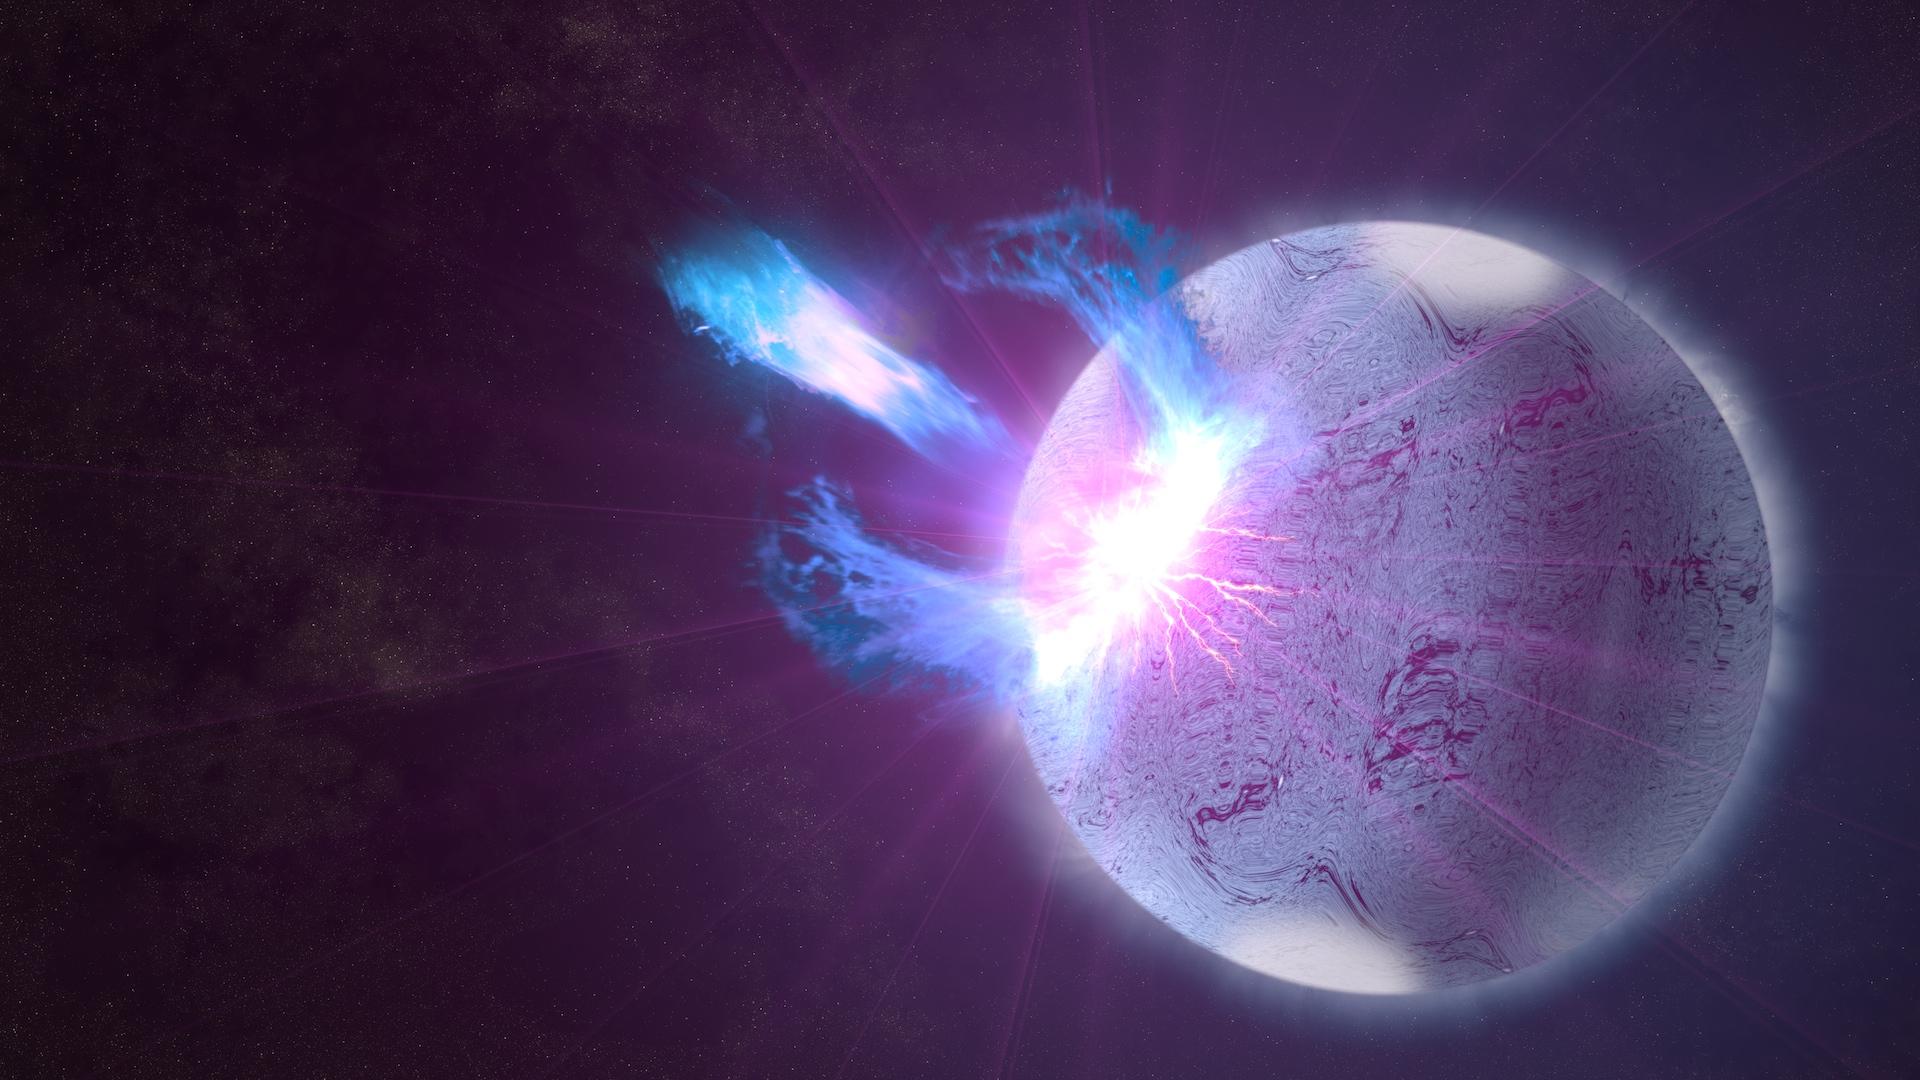 Magnetar utbrott, illustration https://www.nasa.gov/content/goddard/nasas-fermi-satellite-finds-hints-of-starquakes-in-magnetar-storm